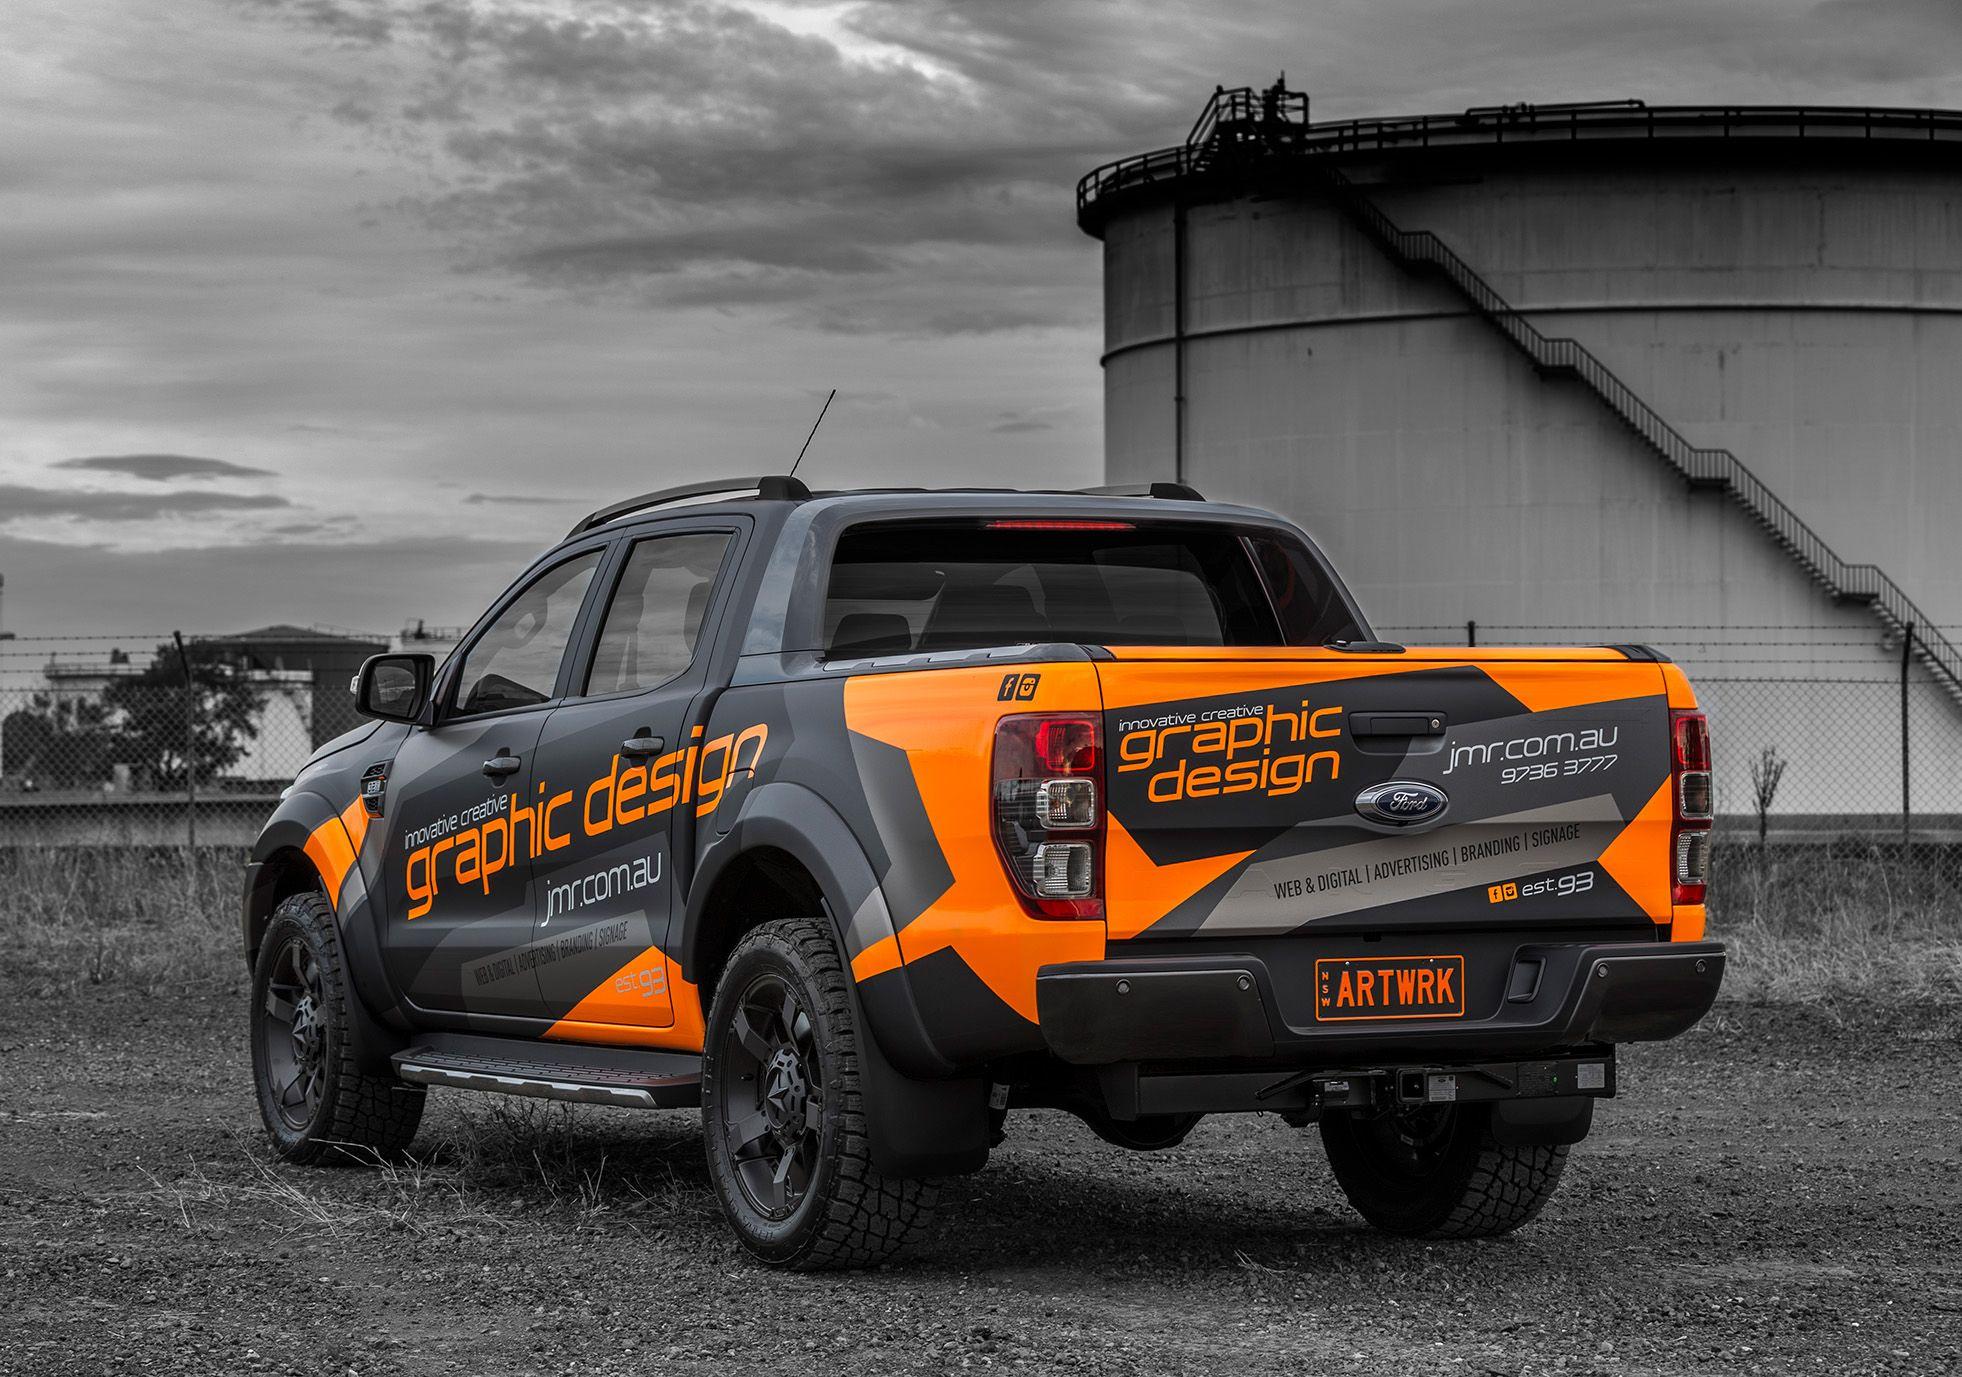 Custom Vehicle Graphic Design Ford Ranger Wildtrak Vehicle